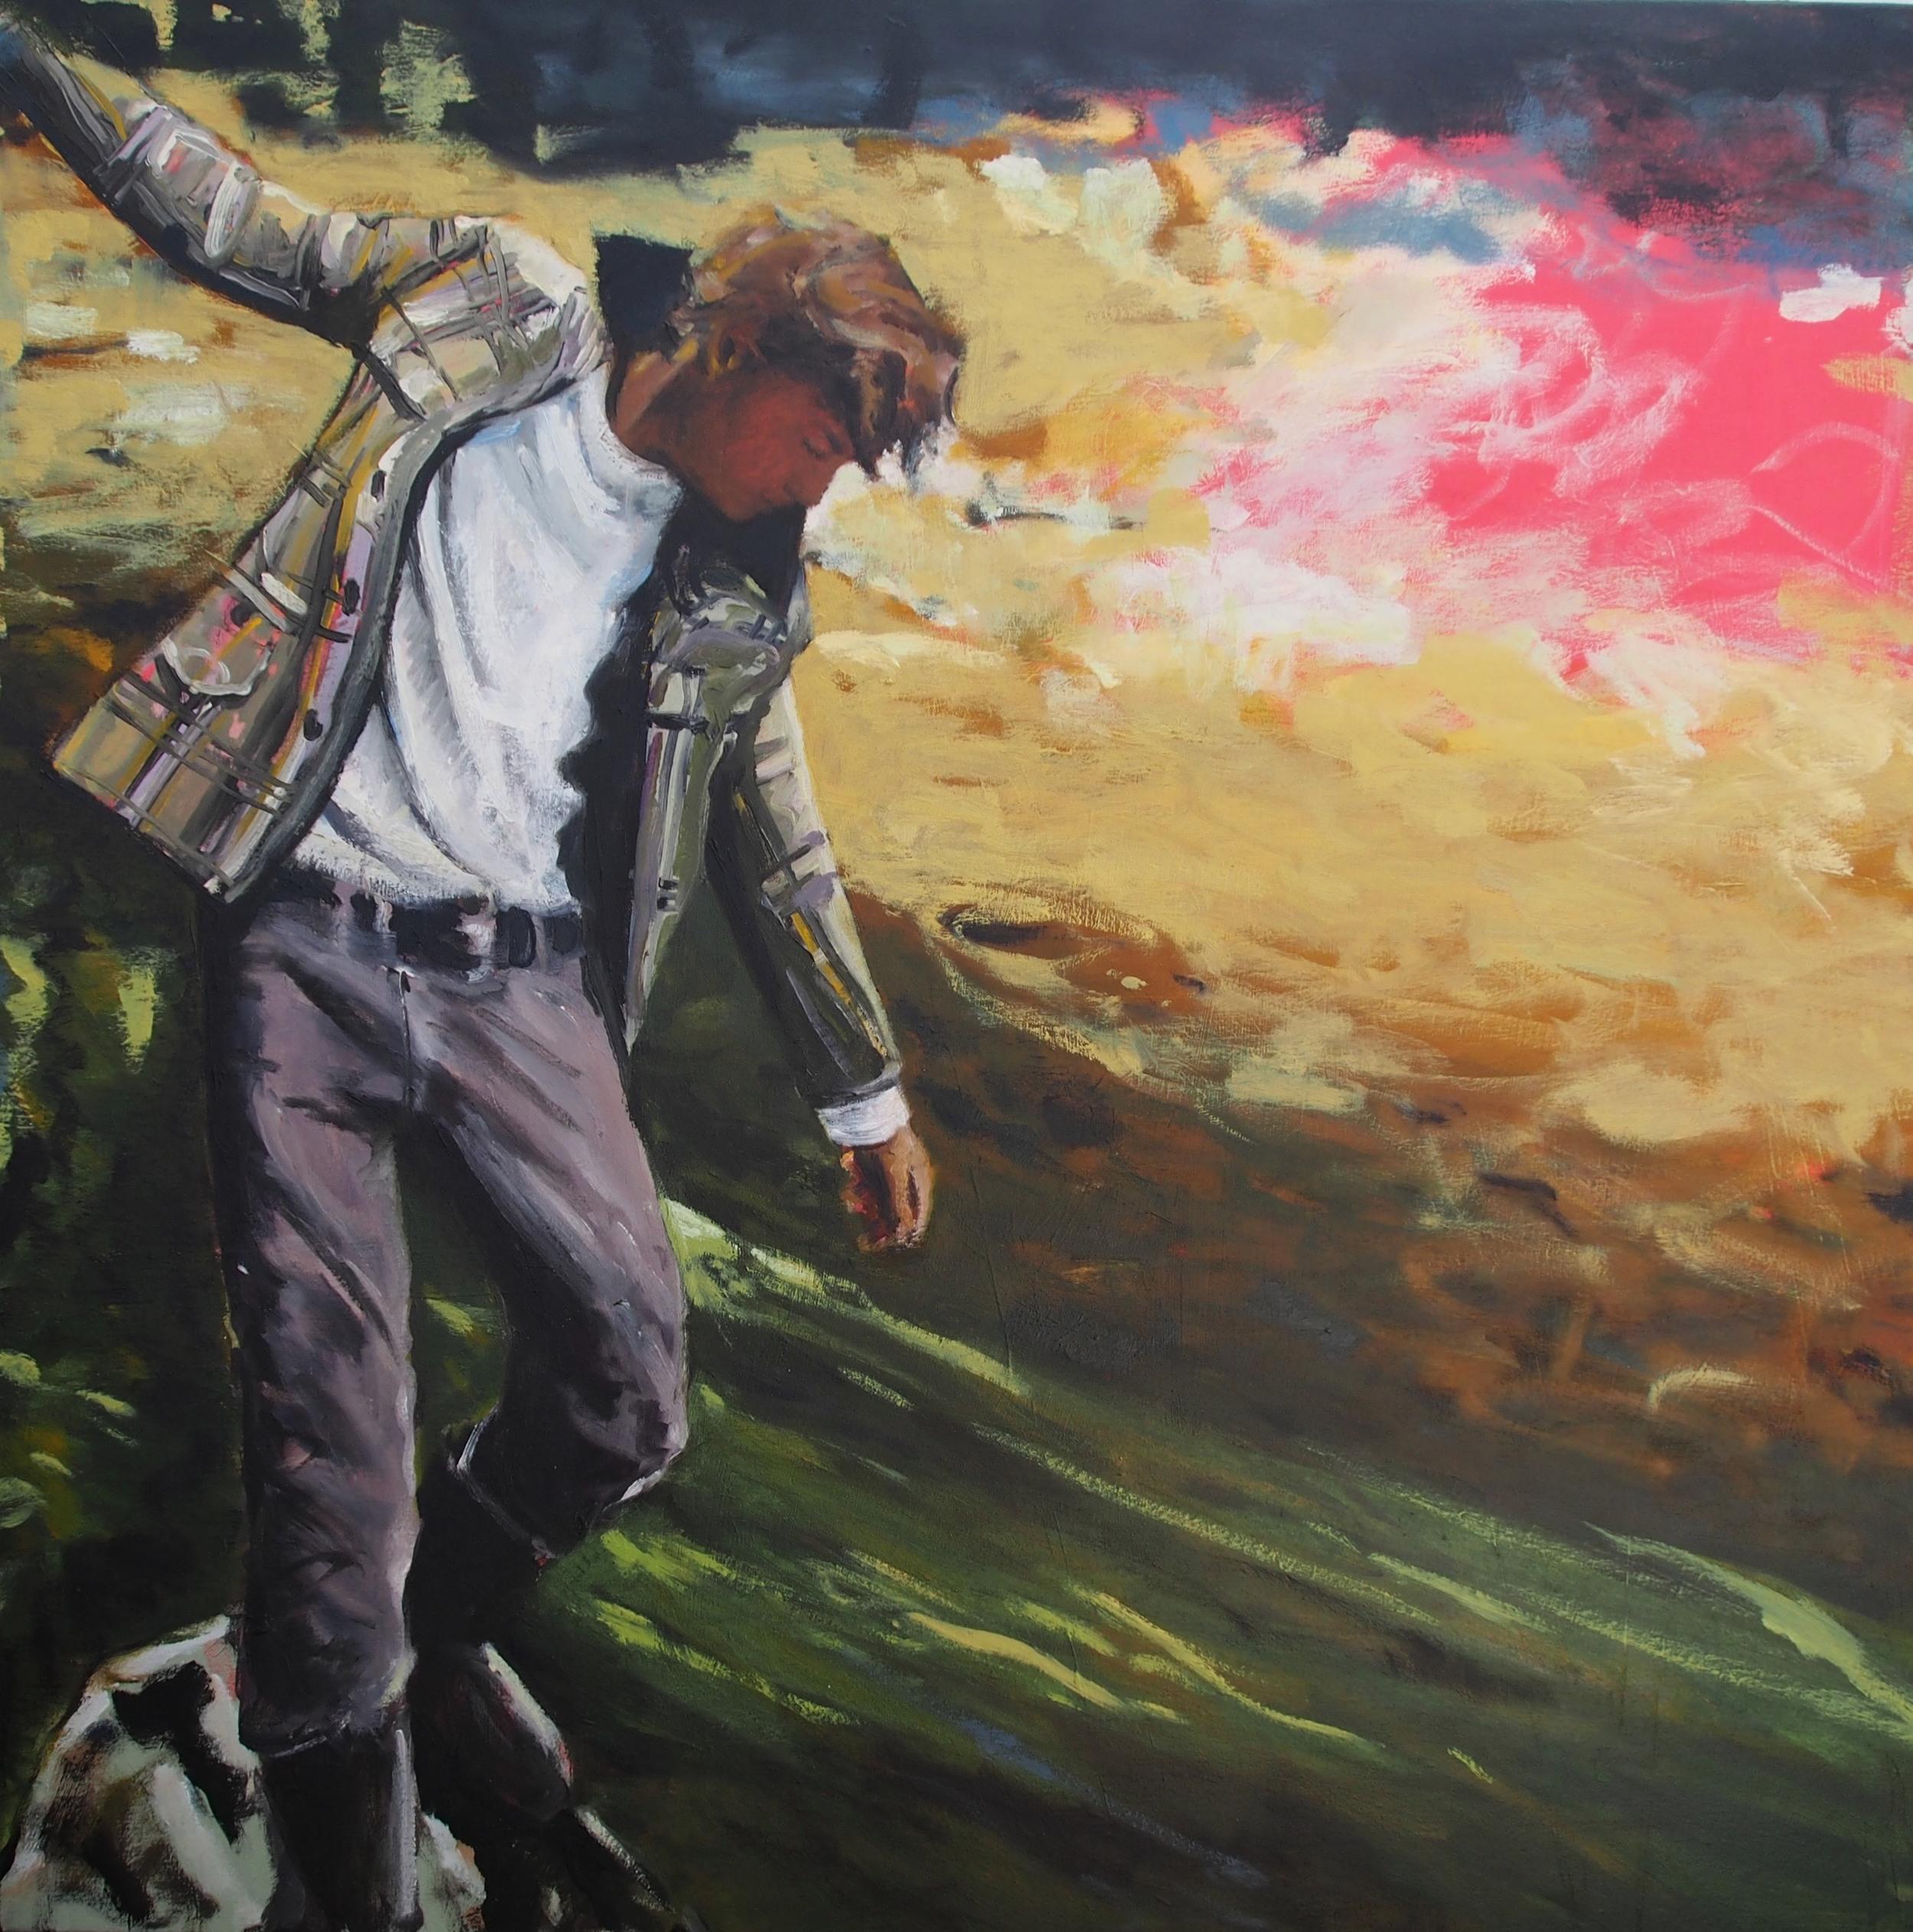 Frenzied Heart,  2013 Oil on canvas 101 x 101 cm